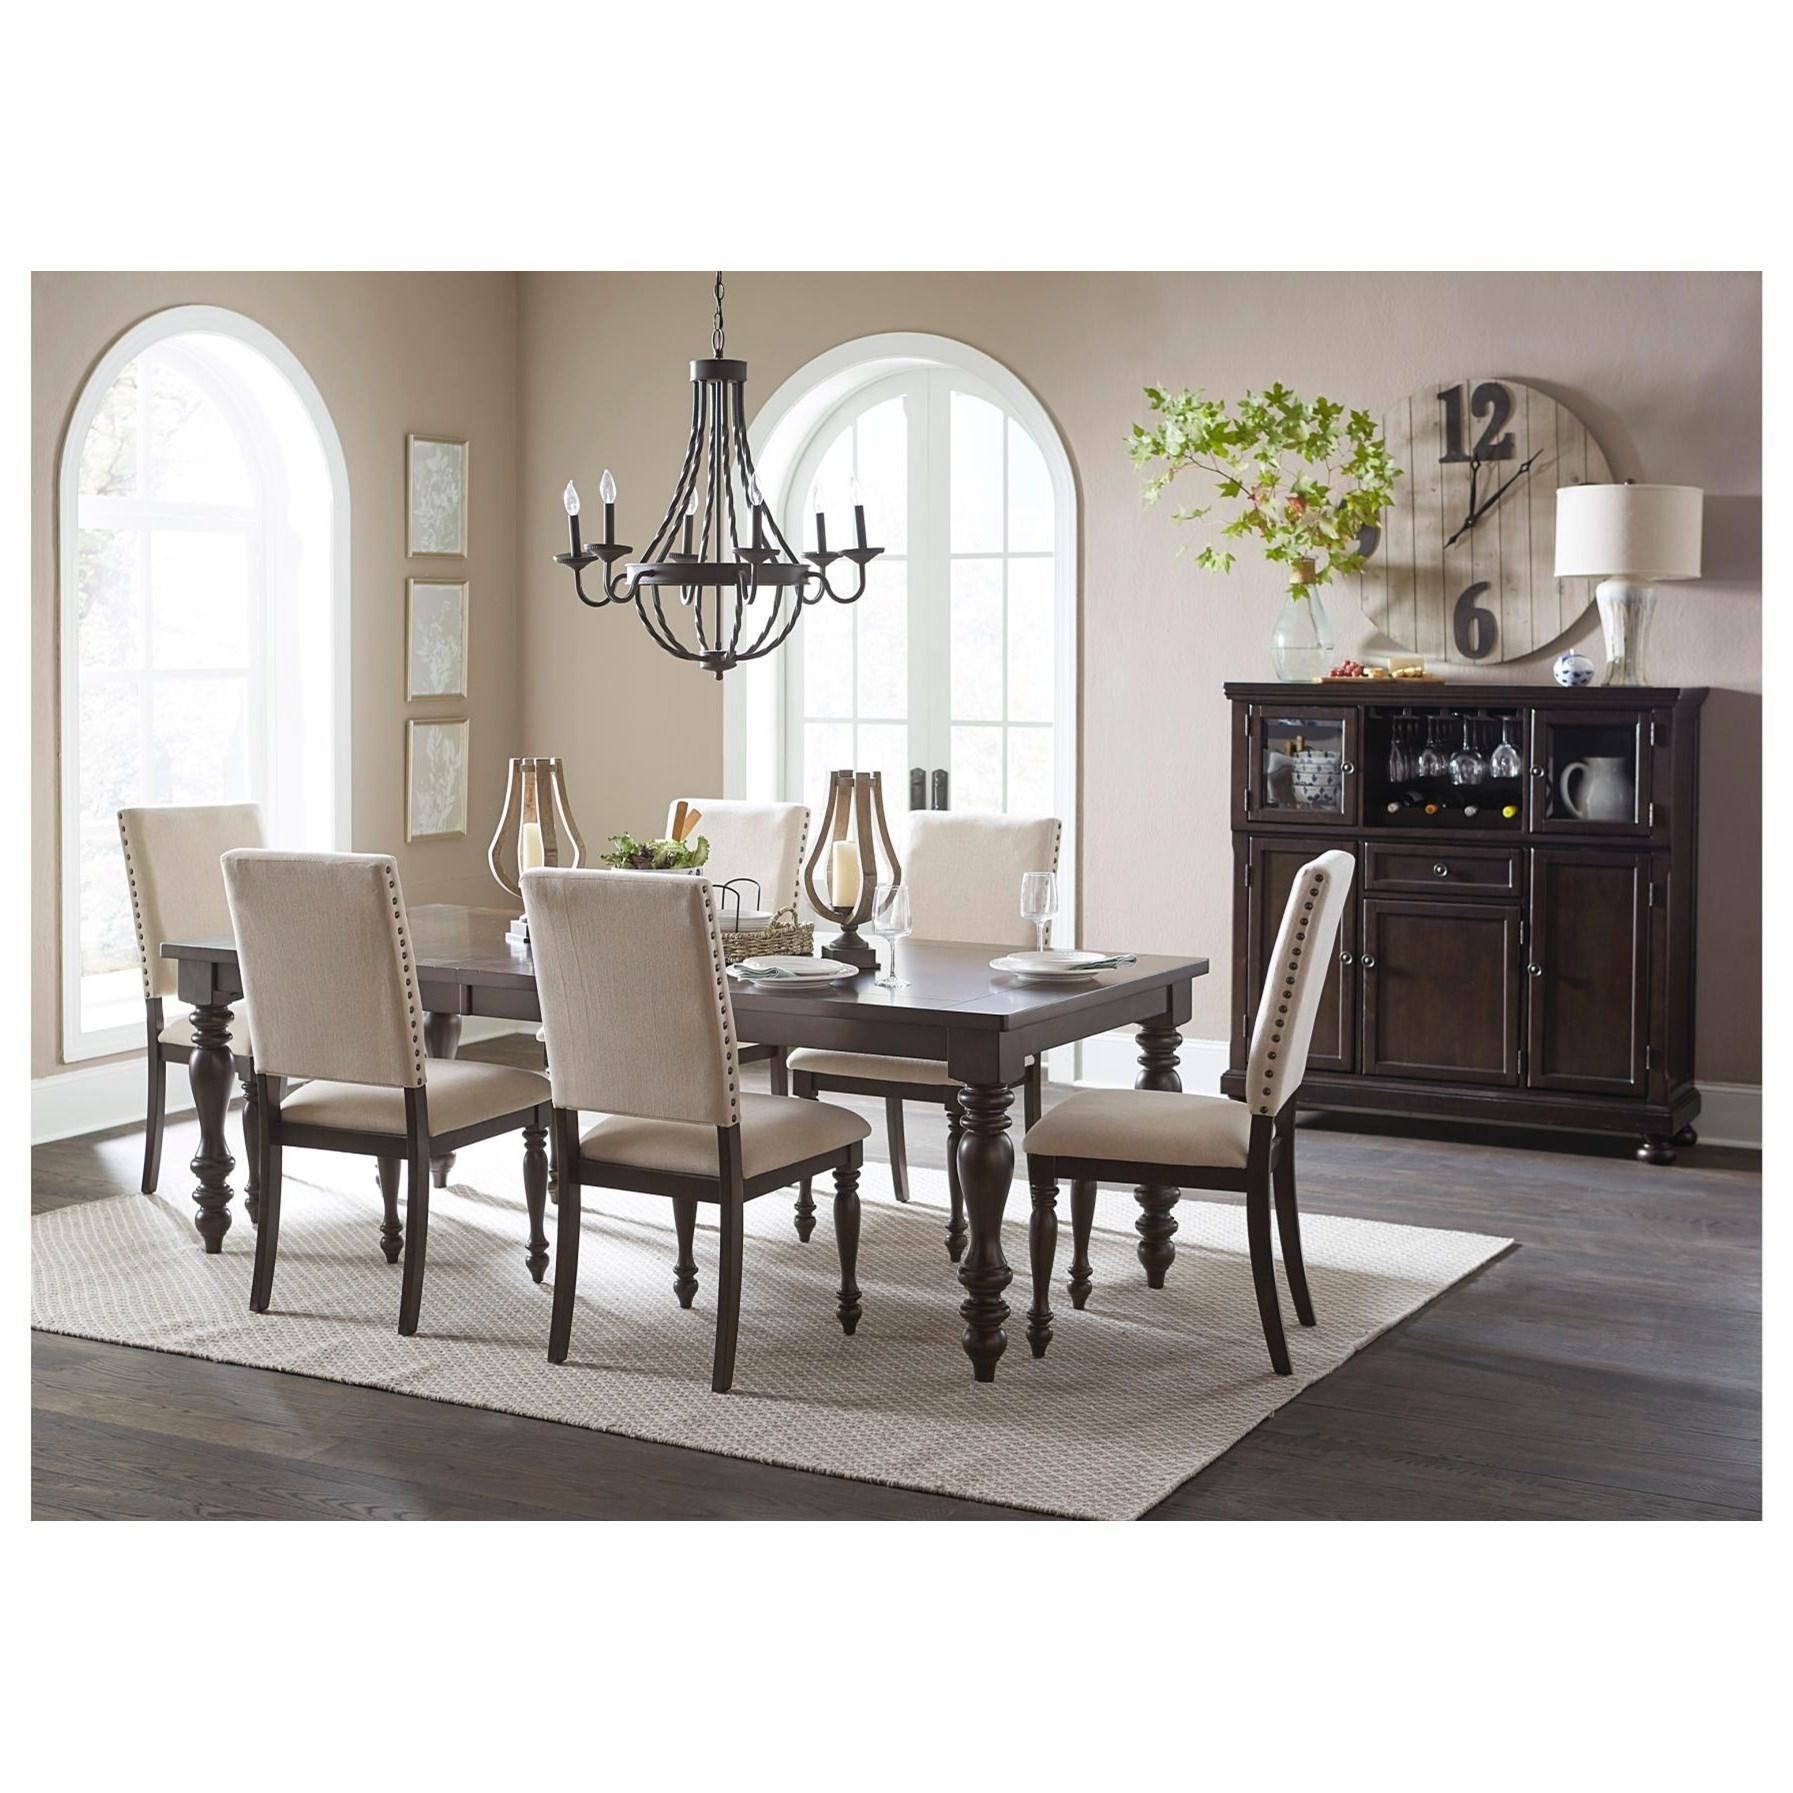 Attractive Homelegance BegoniaFormal Dining Room Group